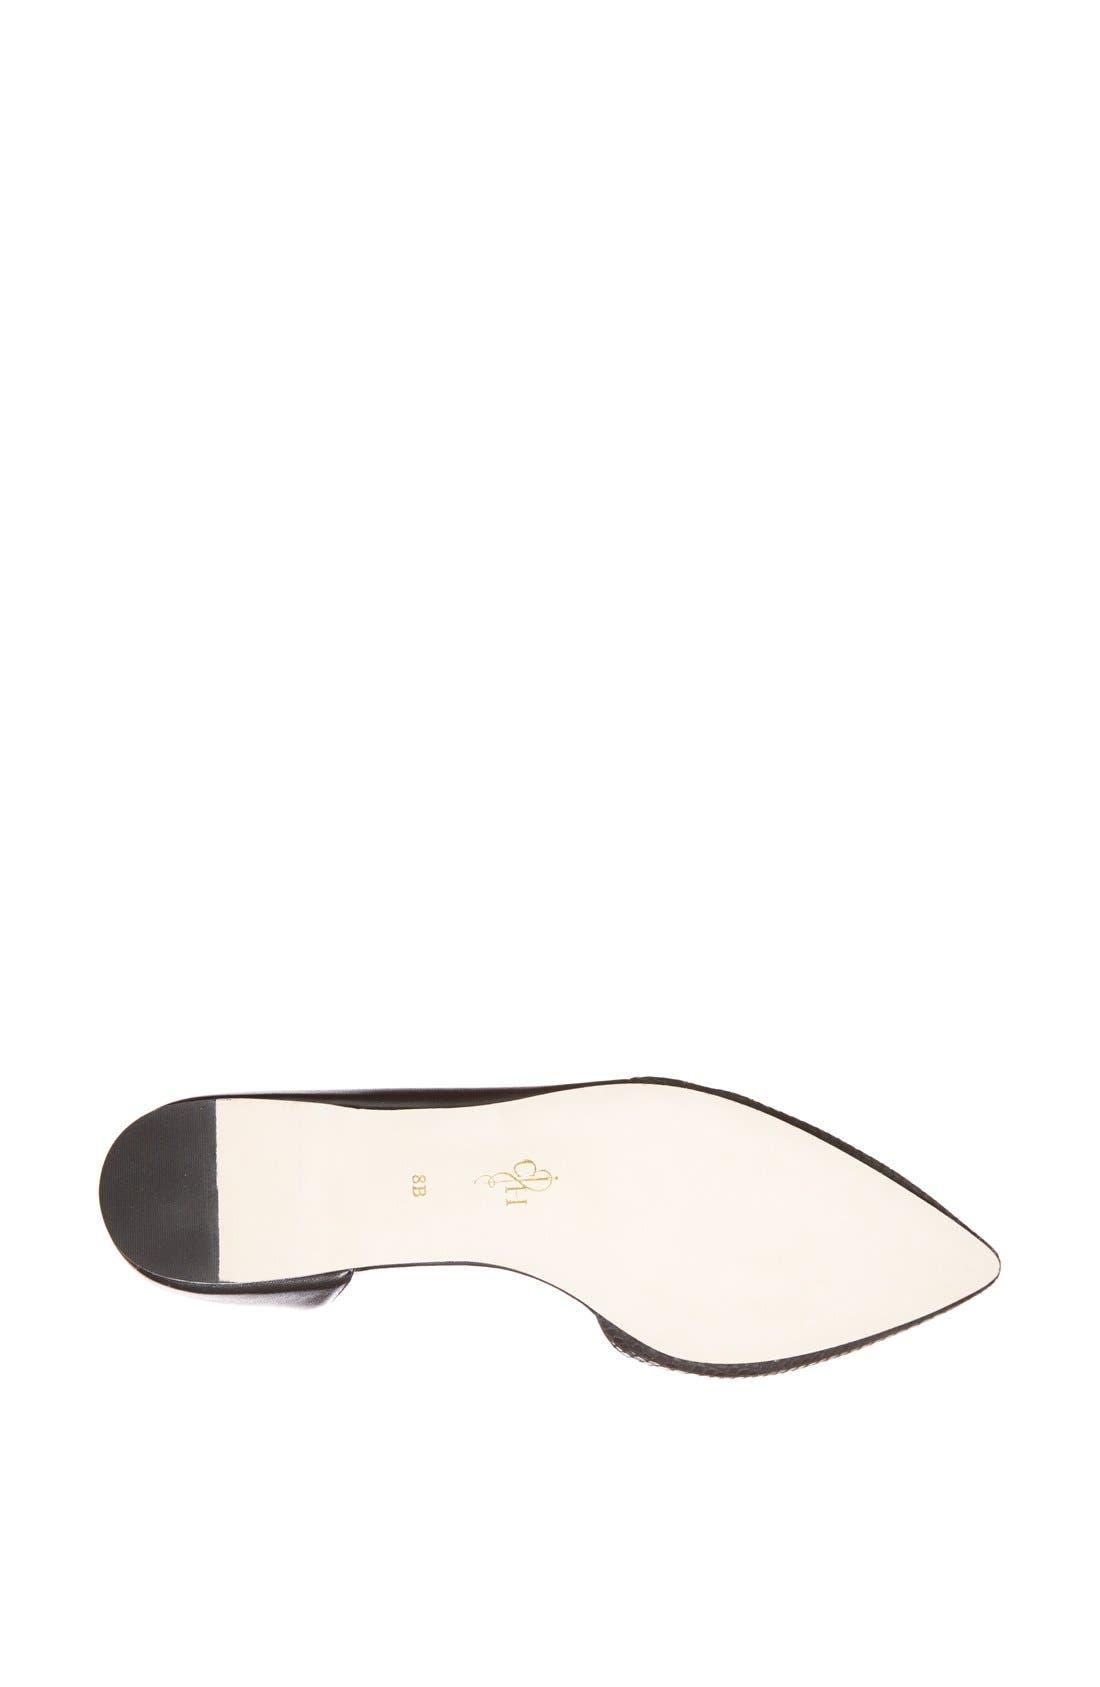 COLE HAAN,                             'Amalia' Half d'Orsay Skimmer Flat,                             Alternate thumbnail 4, color,                             001